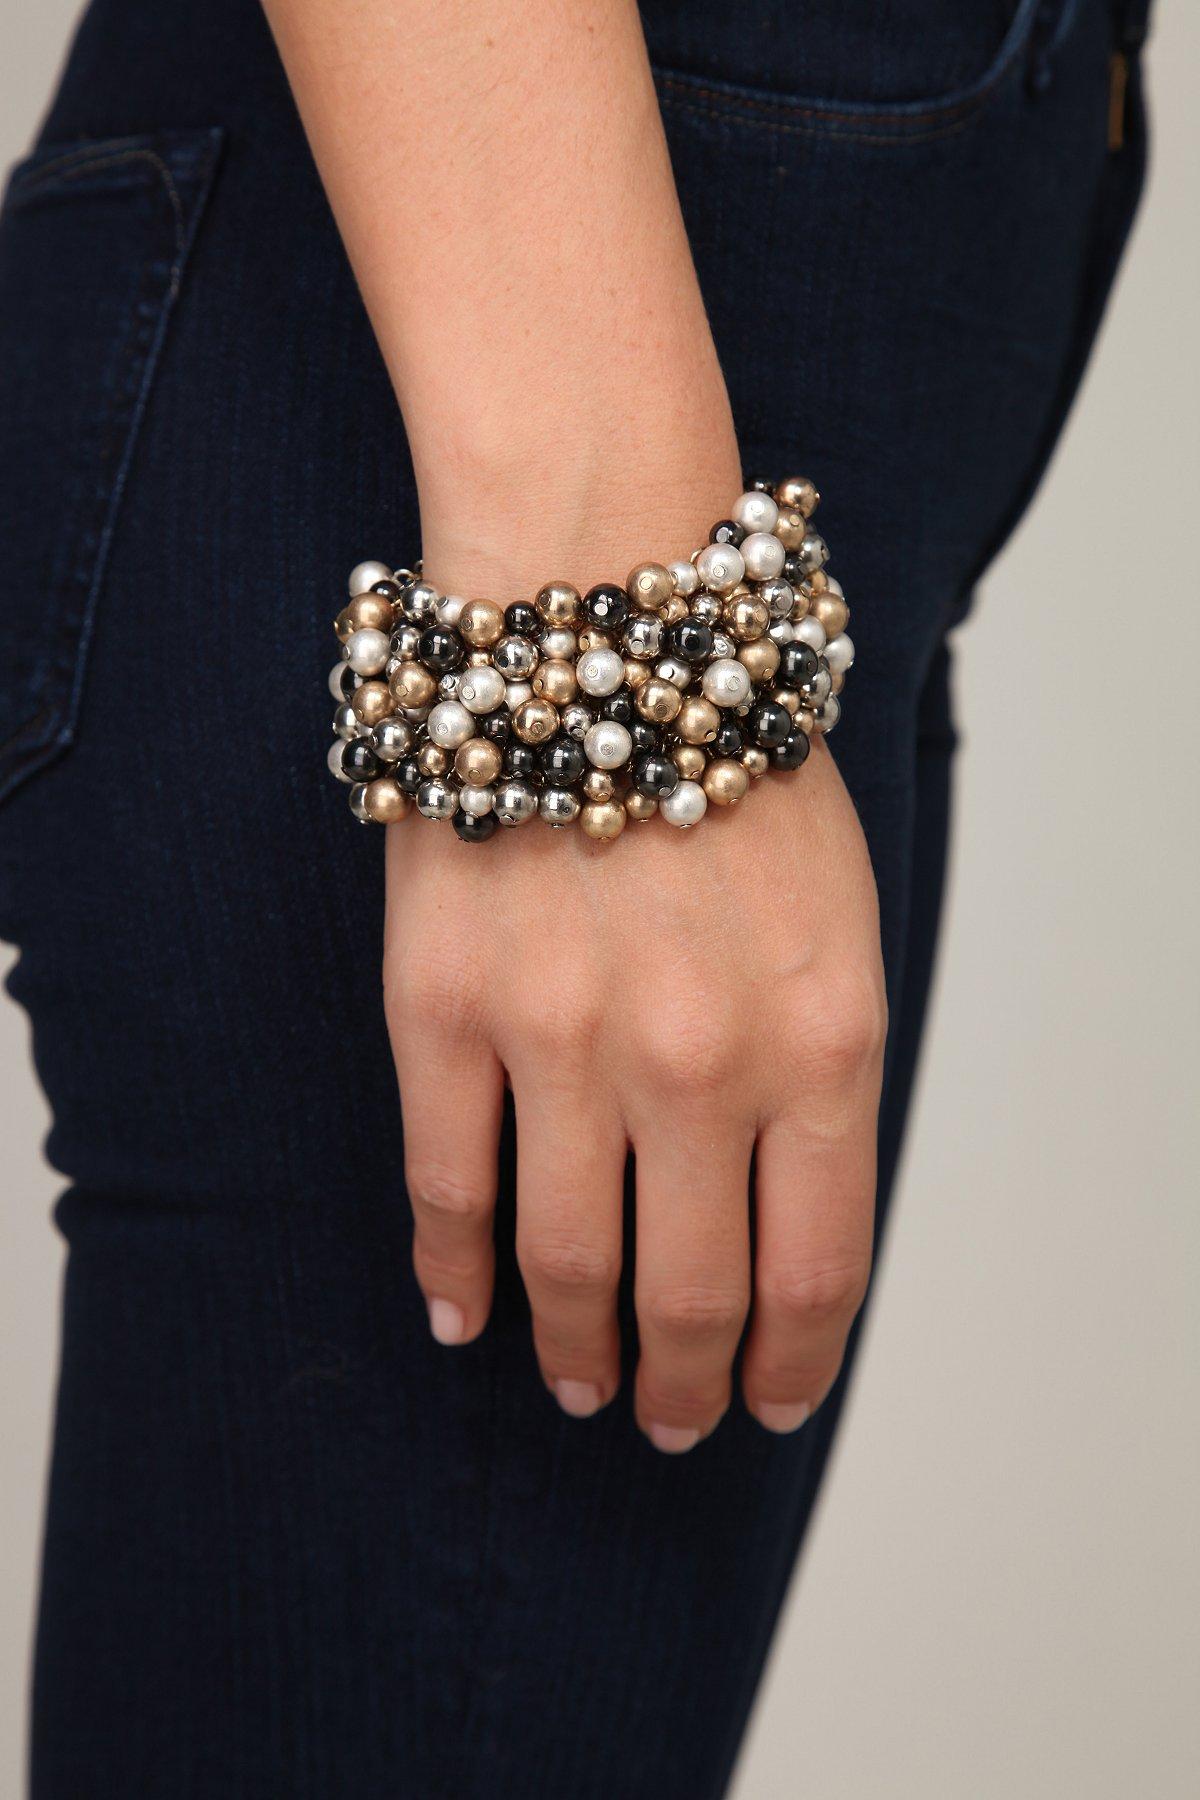 Beaded Lady Bracelet